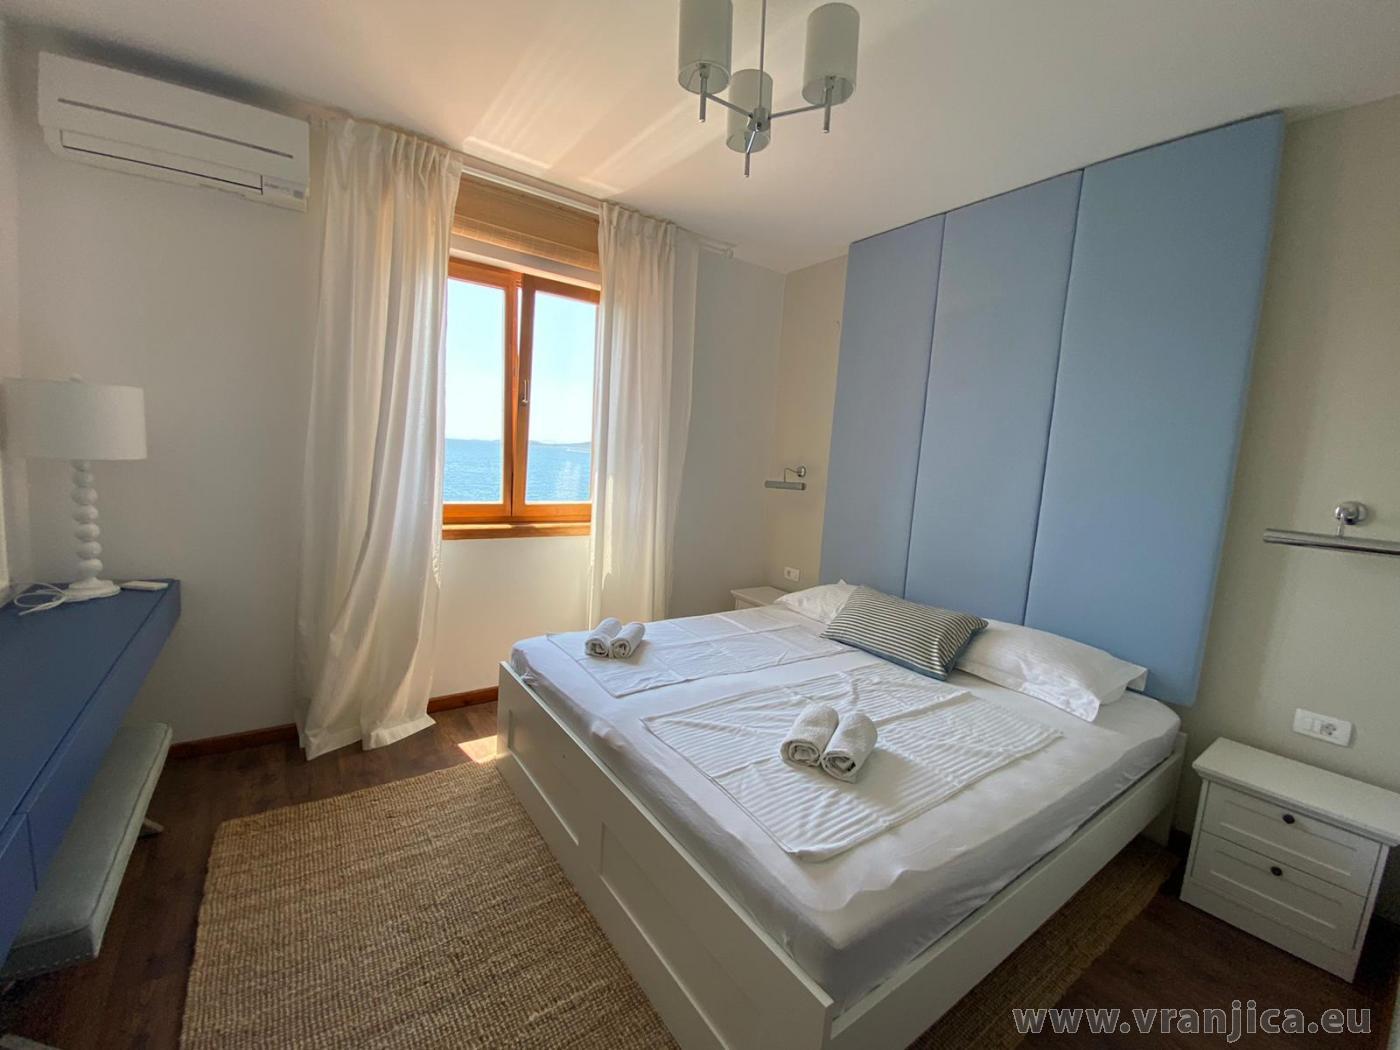 https://www.vranjica.eu/pokoje/apartman-veronika-ap2-3-1627477993L.jpg